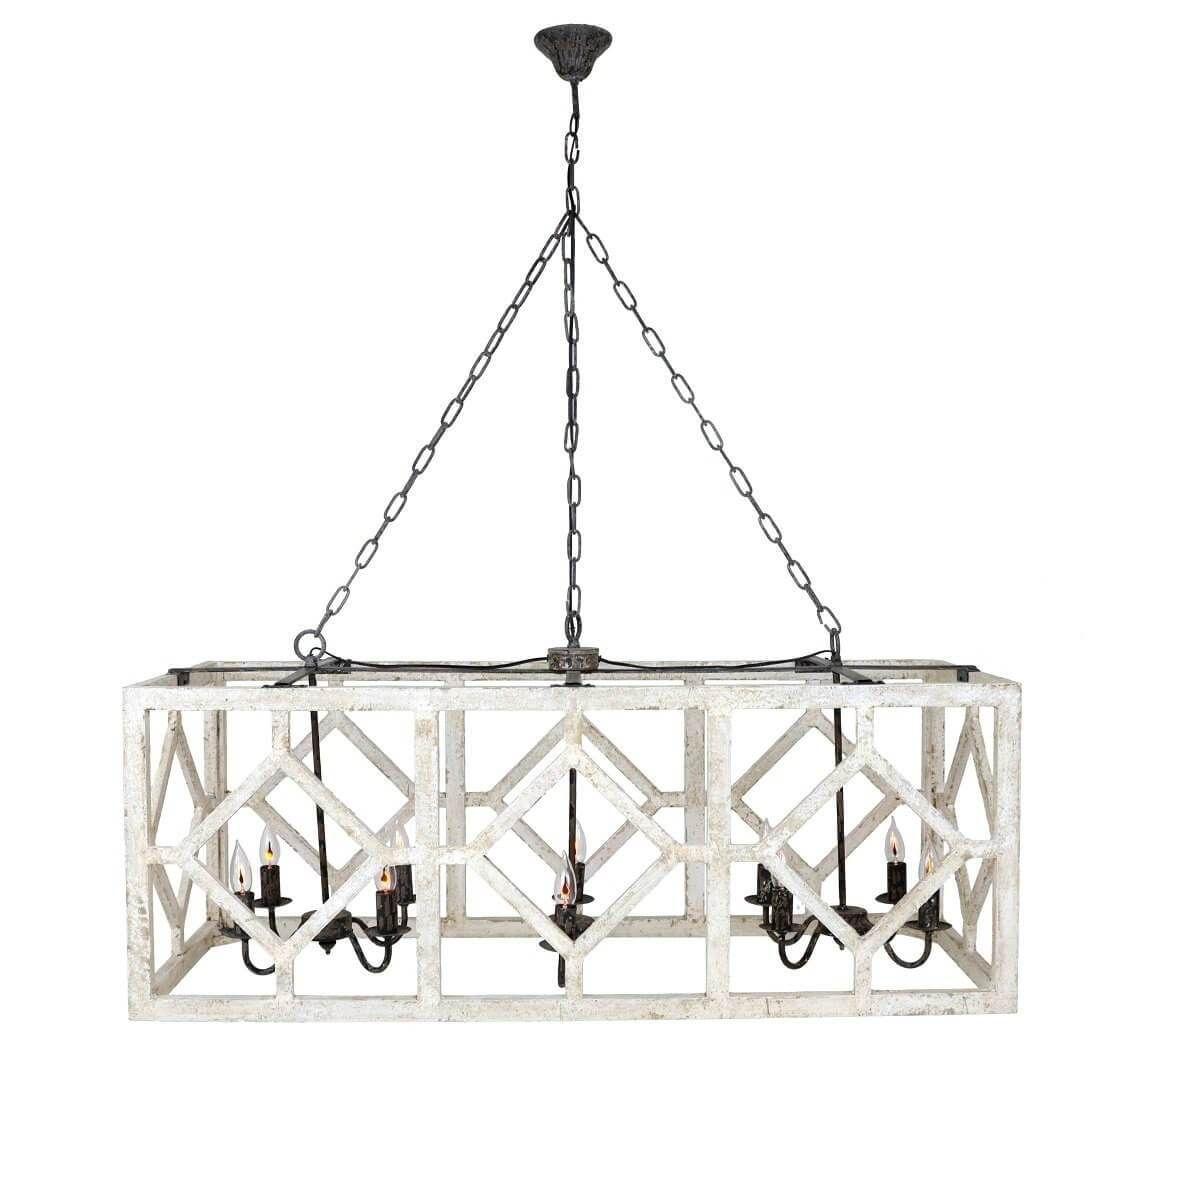 Myrtle 10 Light Rectangular Pendant Light Rectangular Pendant Light Wooden Light Fixtures Wooden Chandelier